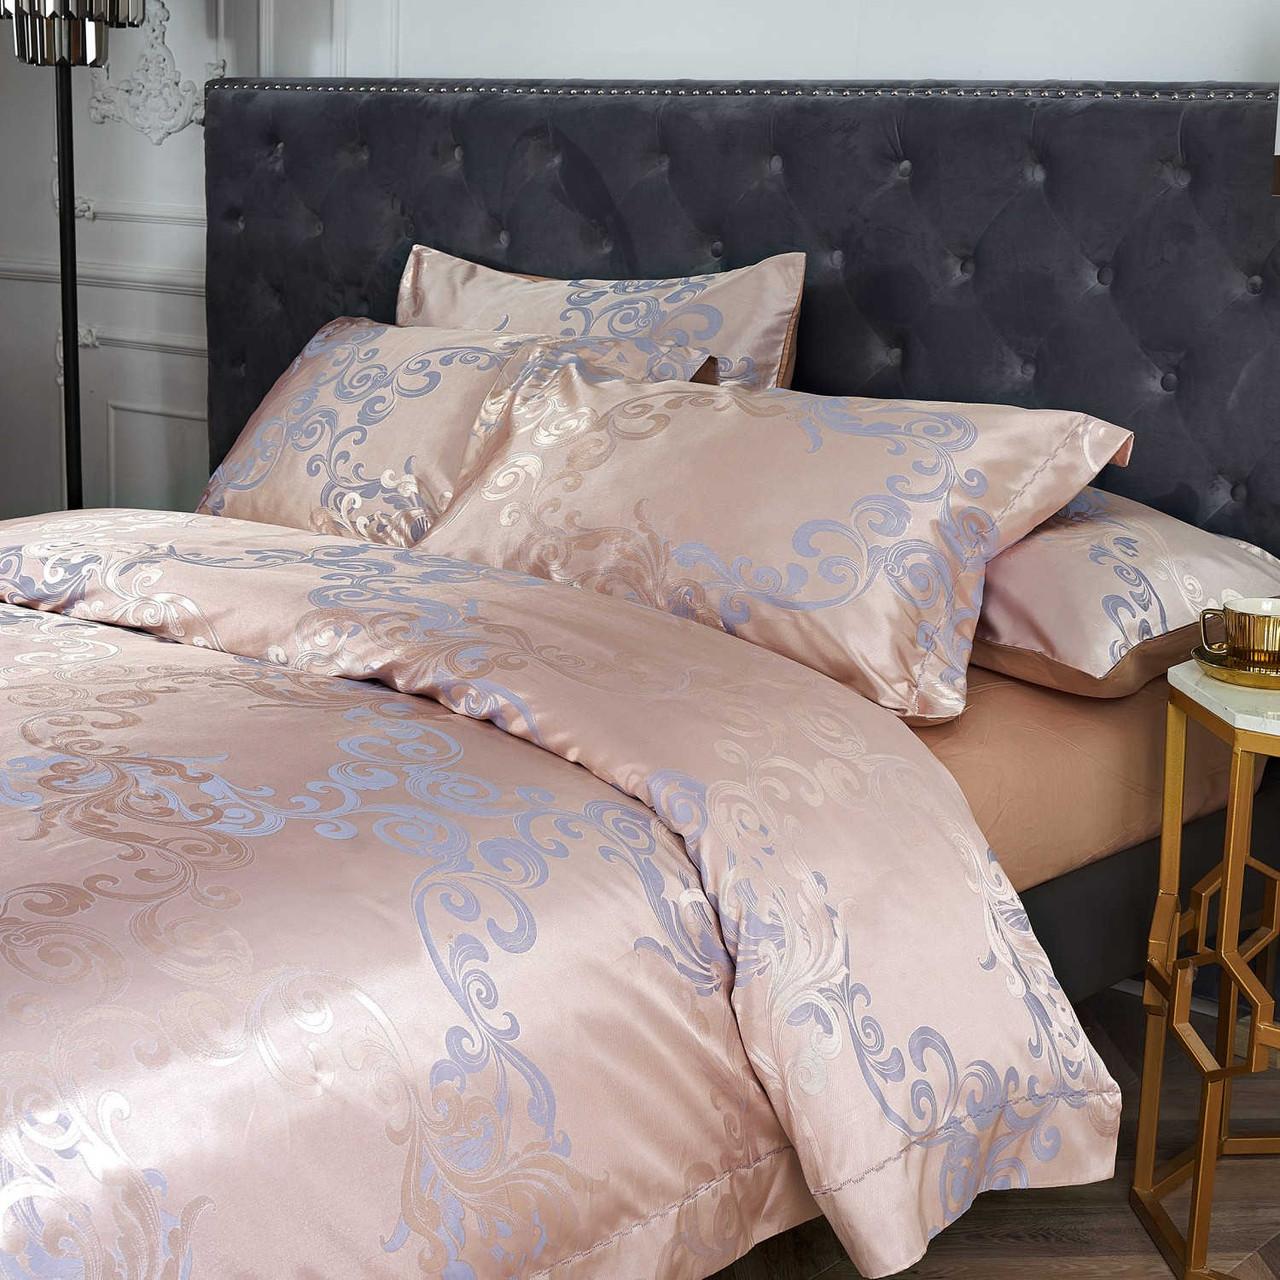 Drop-shipping Wholesale-Luxury Jacquard Material Dolce-Mela Bedding DM801K